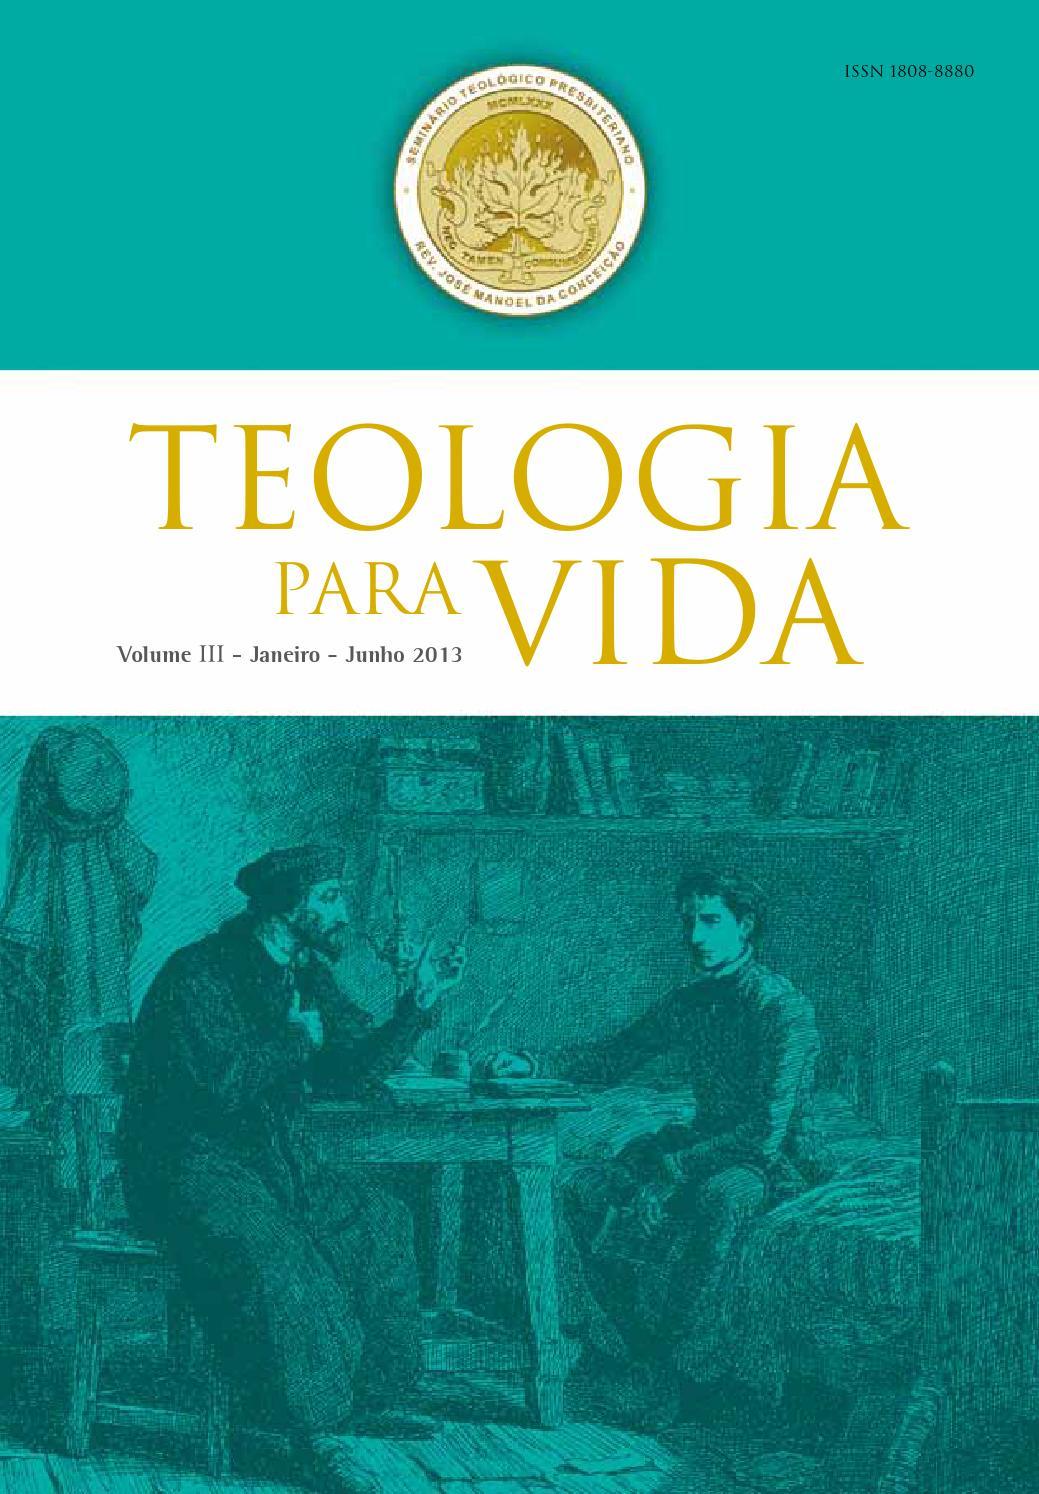 Teologia para vida v iii n 1 by revista teologia para vida issuu fandeluxe Choice Image